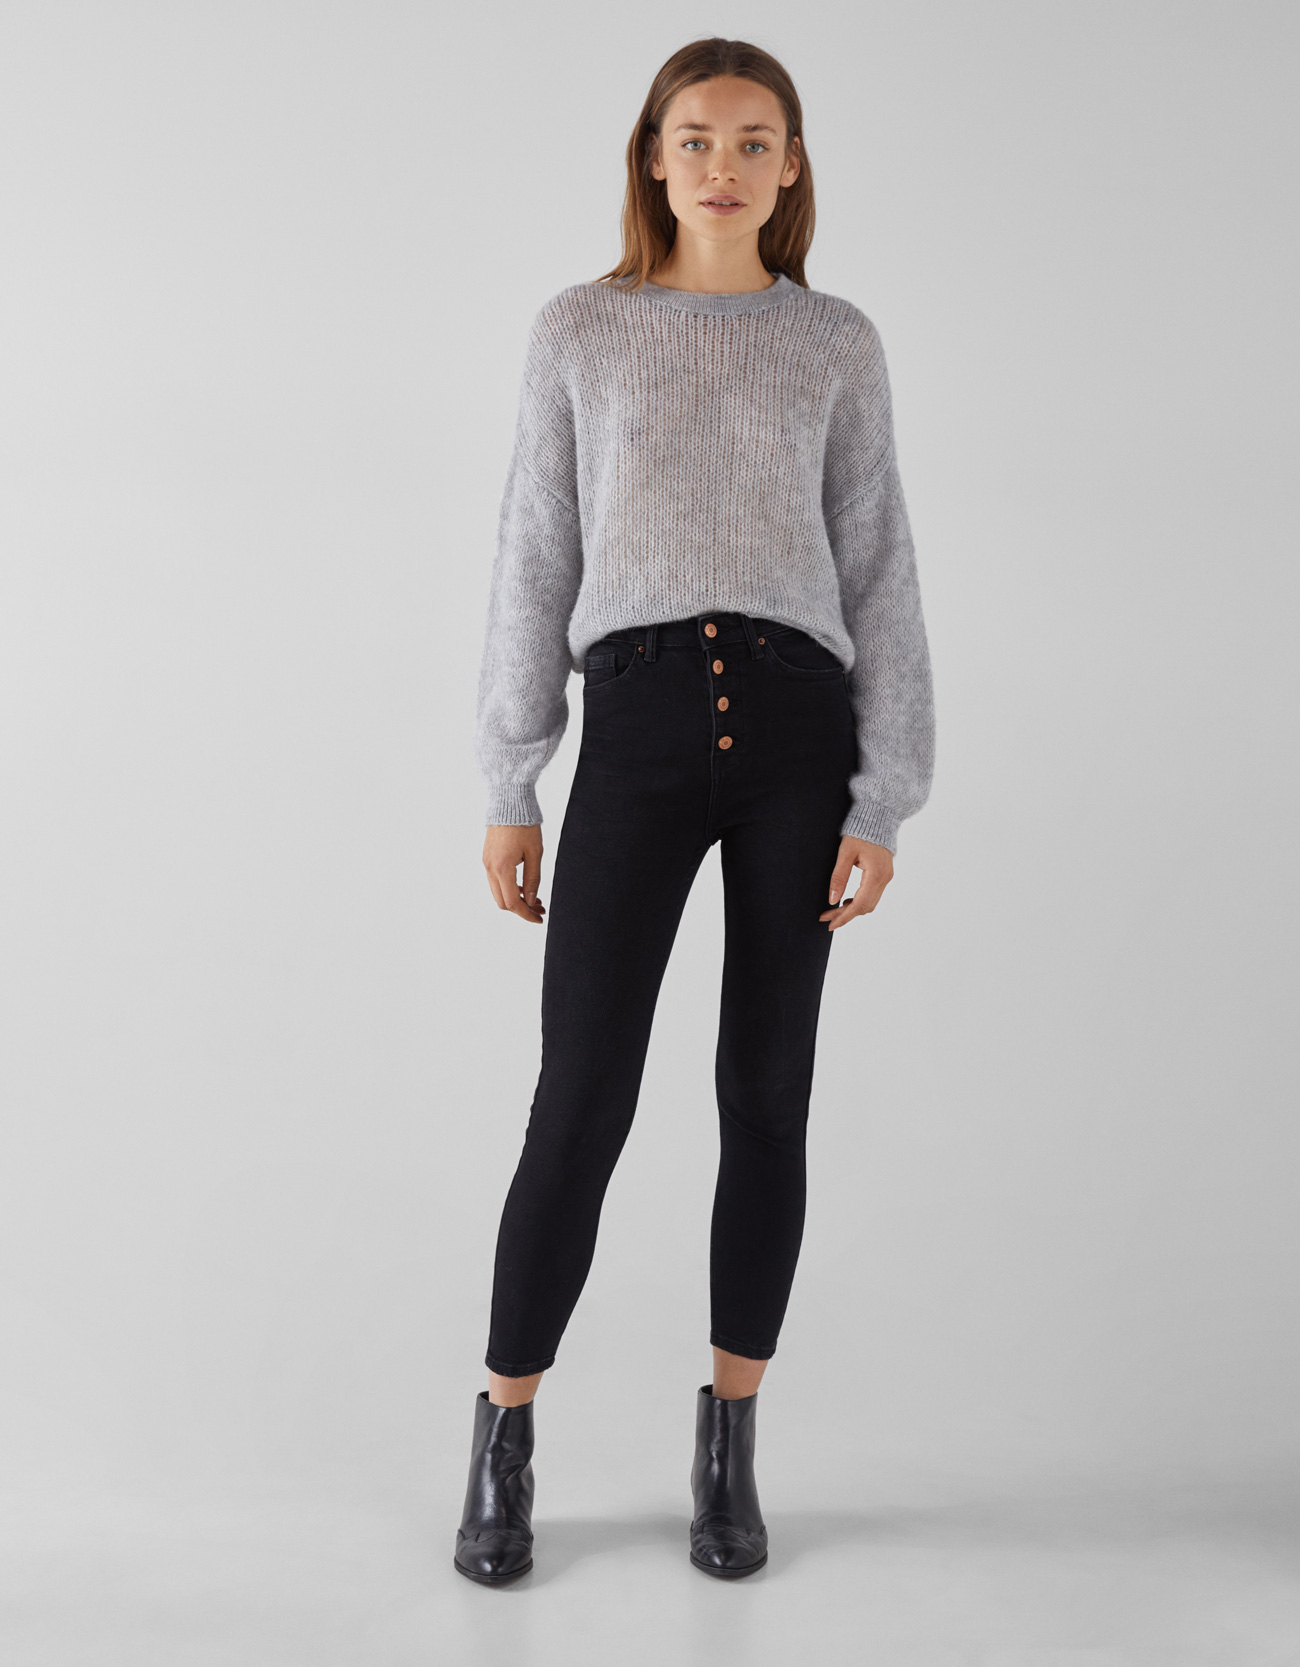 04f42d0399e Jeans Skinny High Rise con botones Join Life - Jeans - Bershka ...